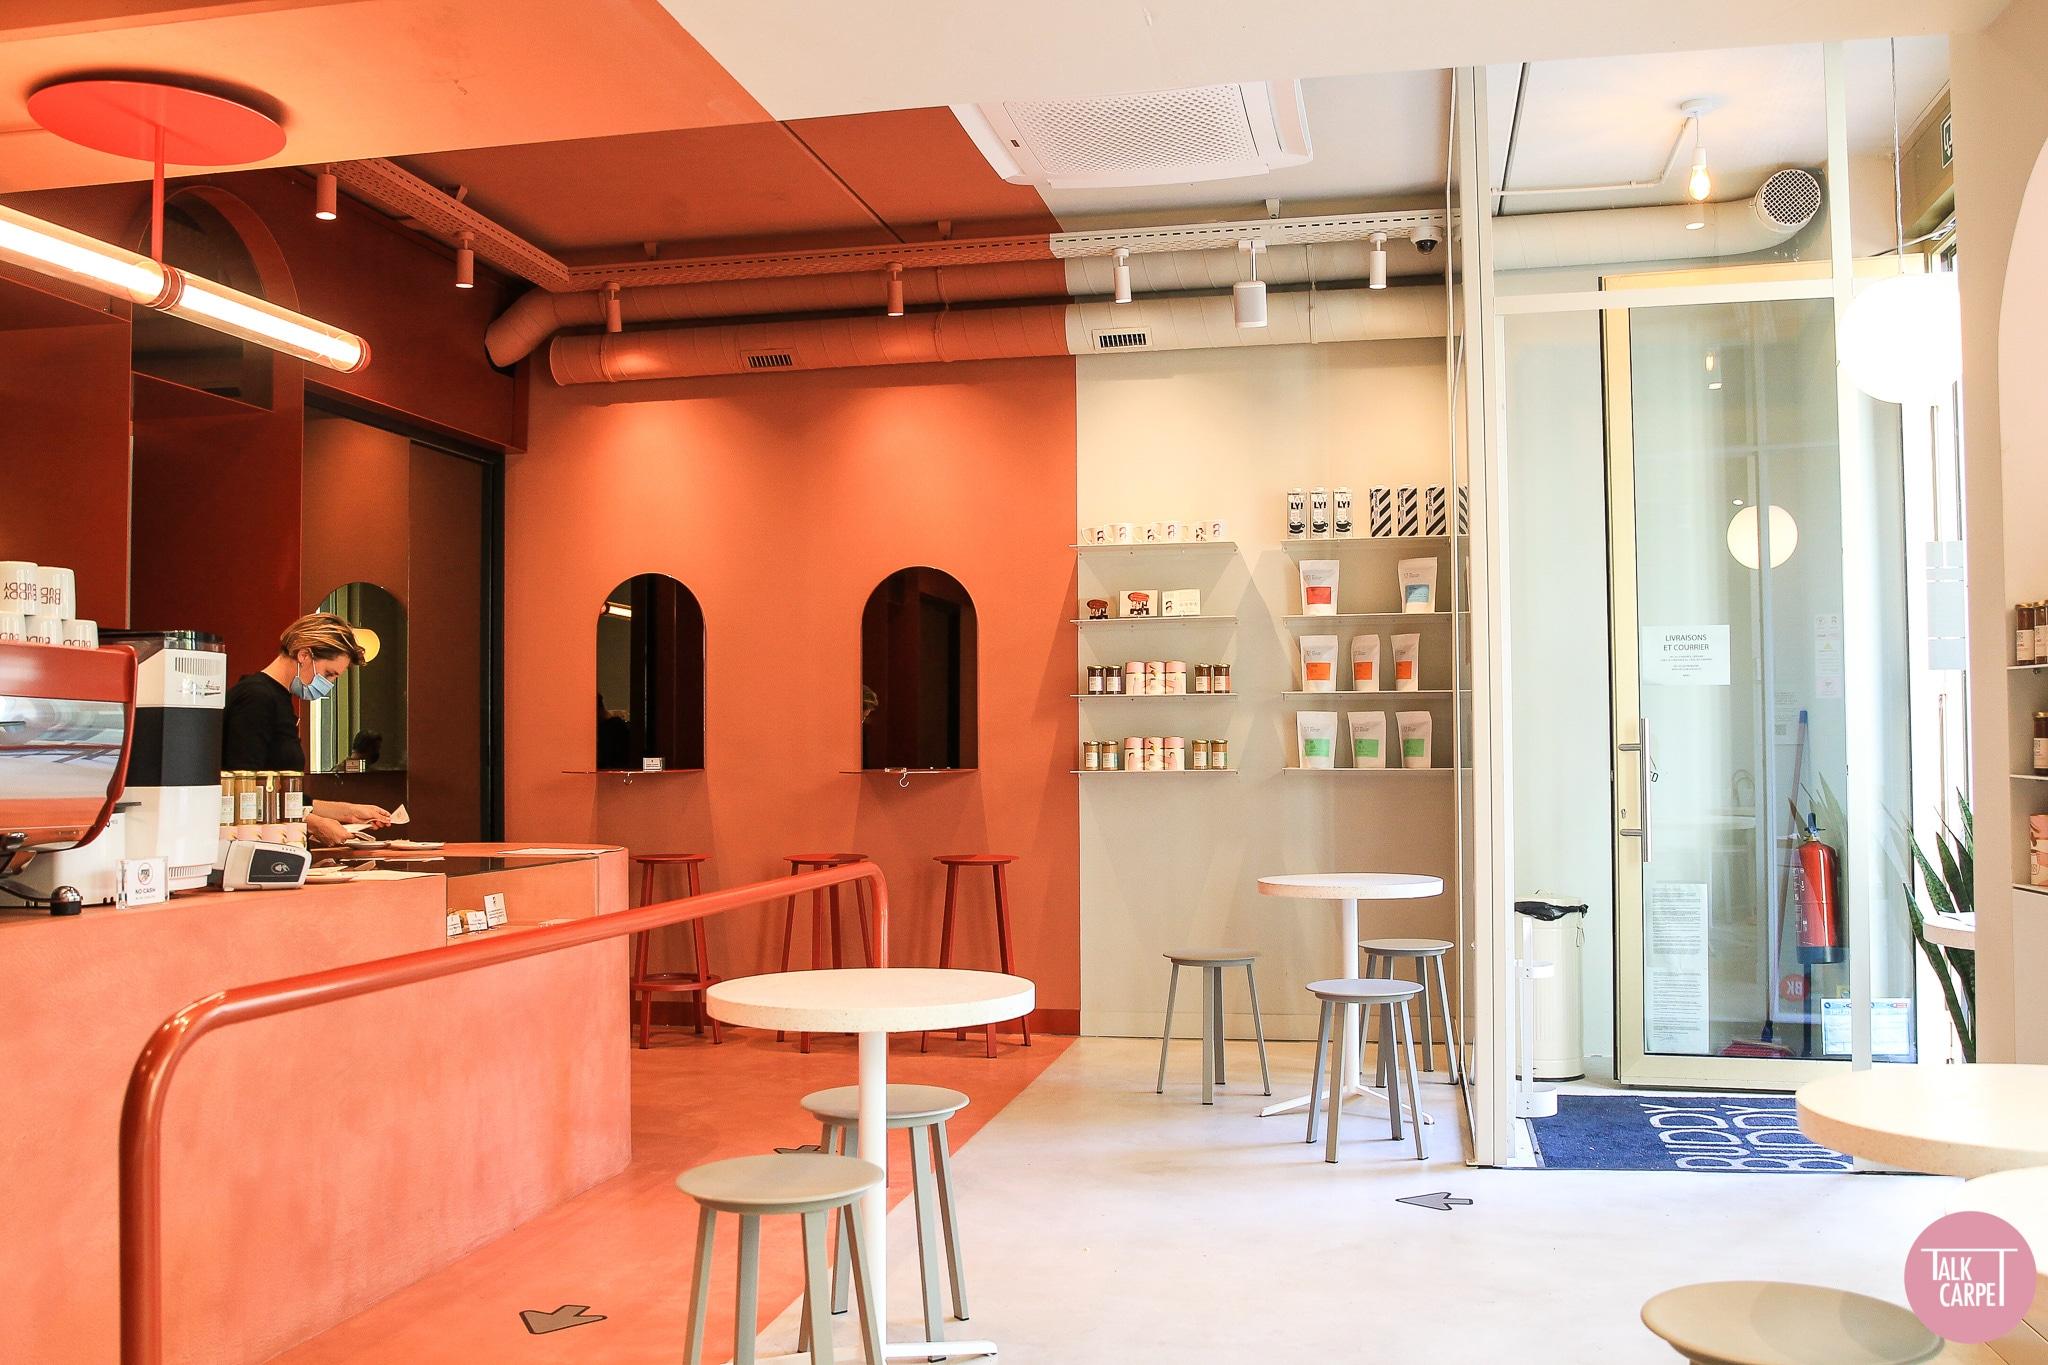 must visit cool restaurants & cafés in Brussels